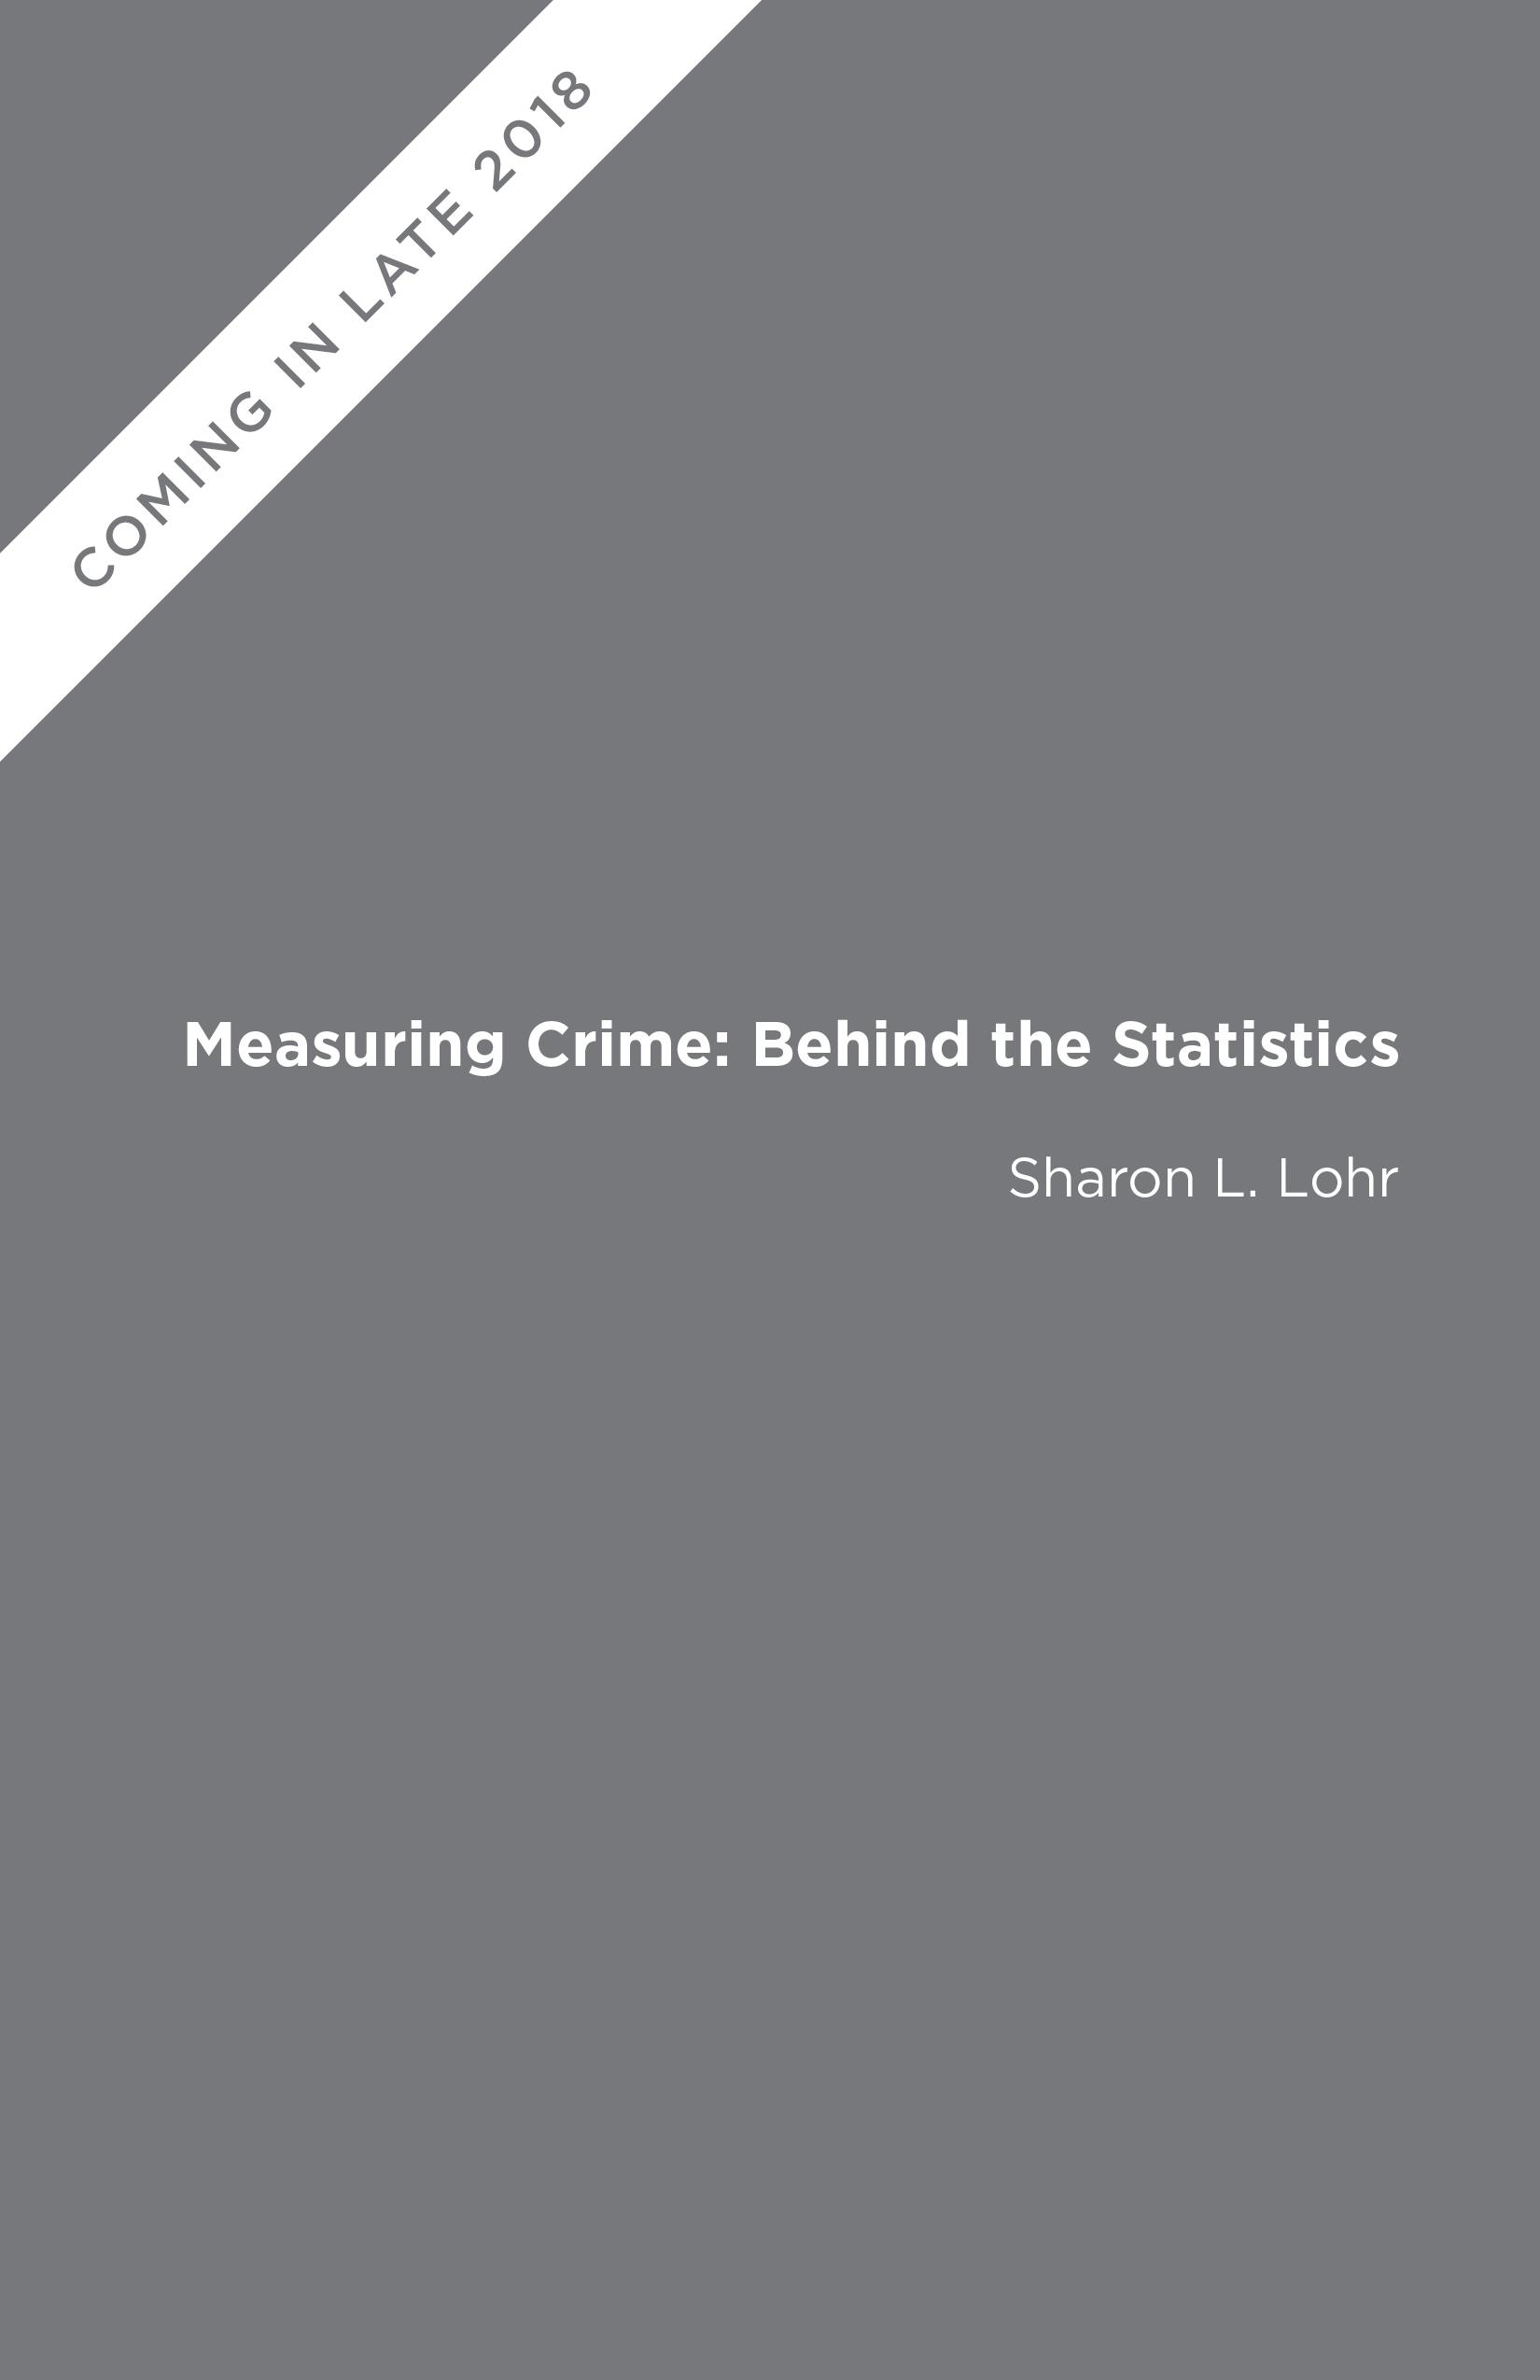 measuring crime book cover.jpg